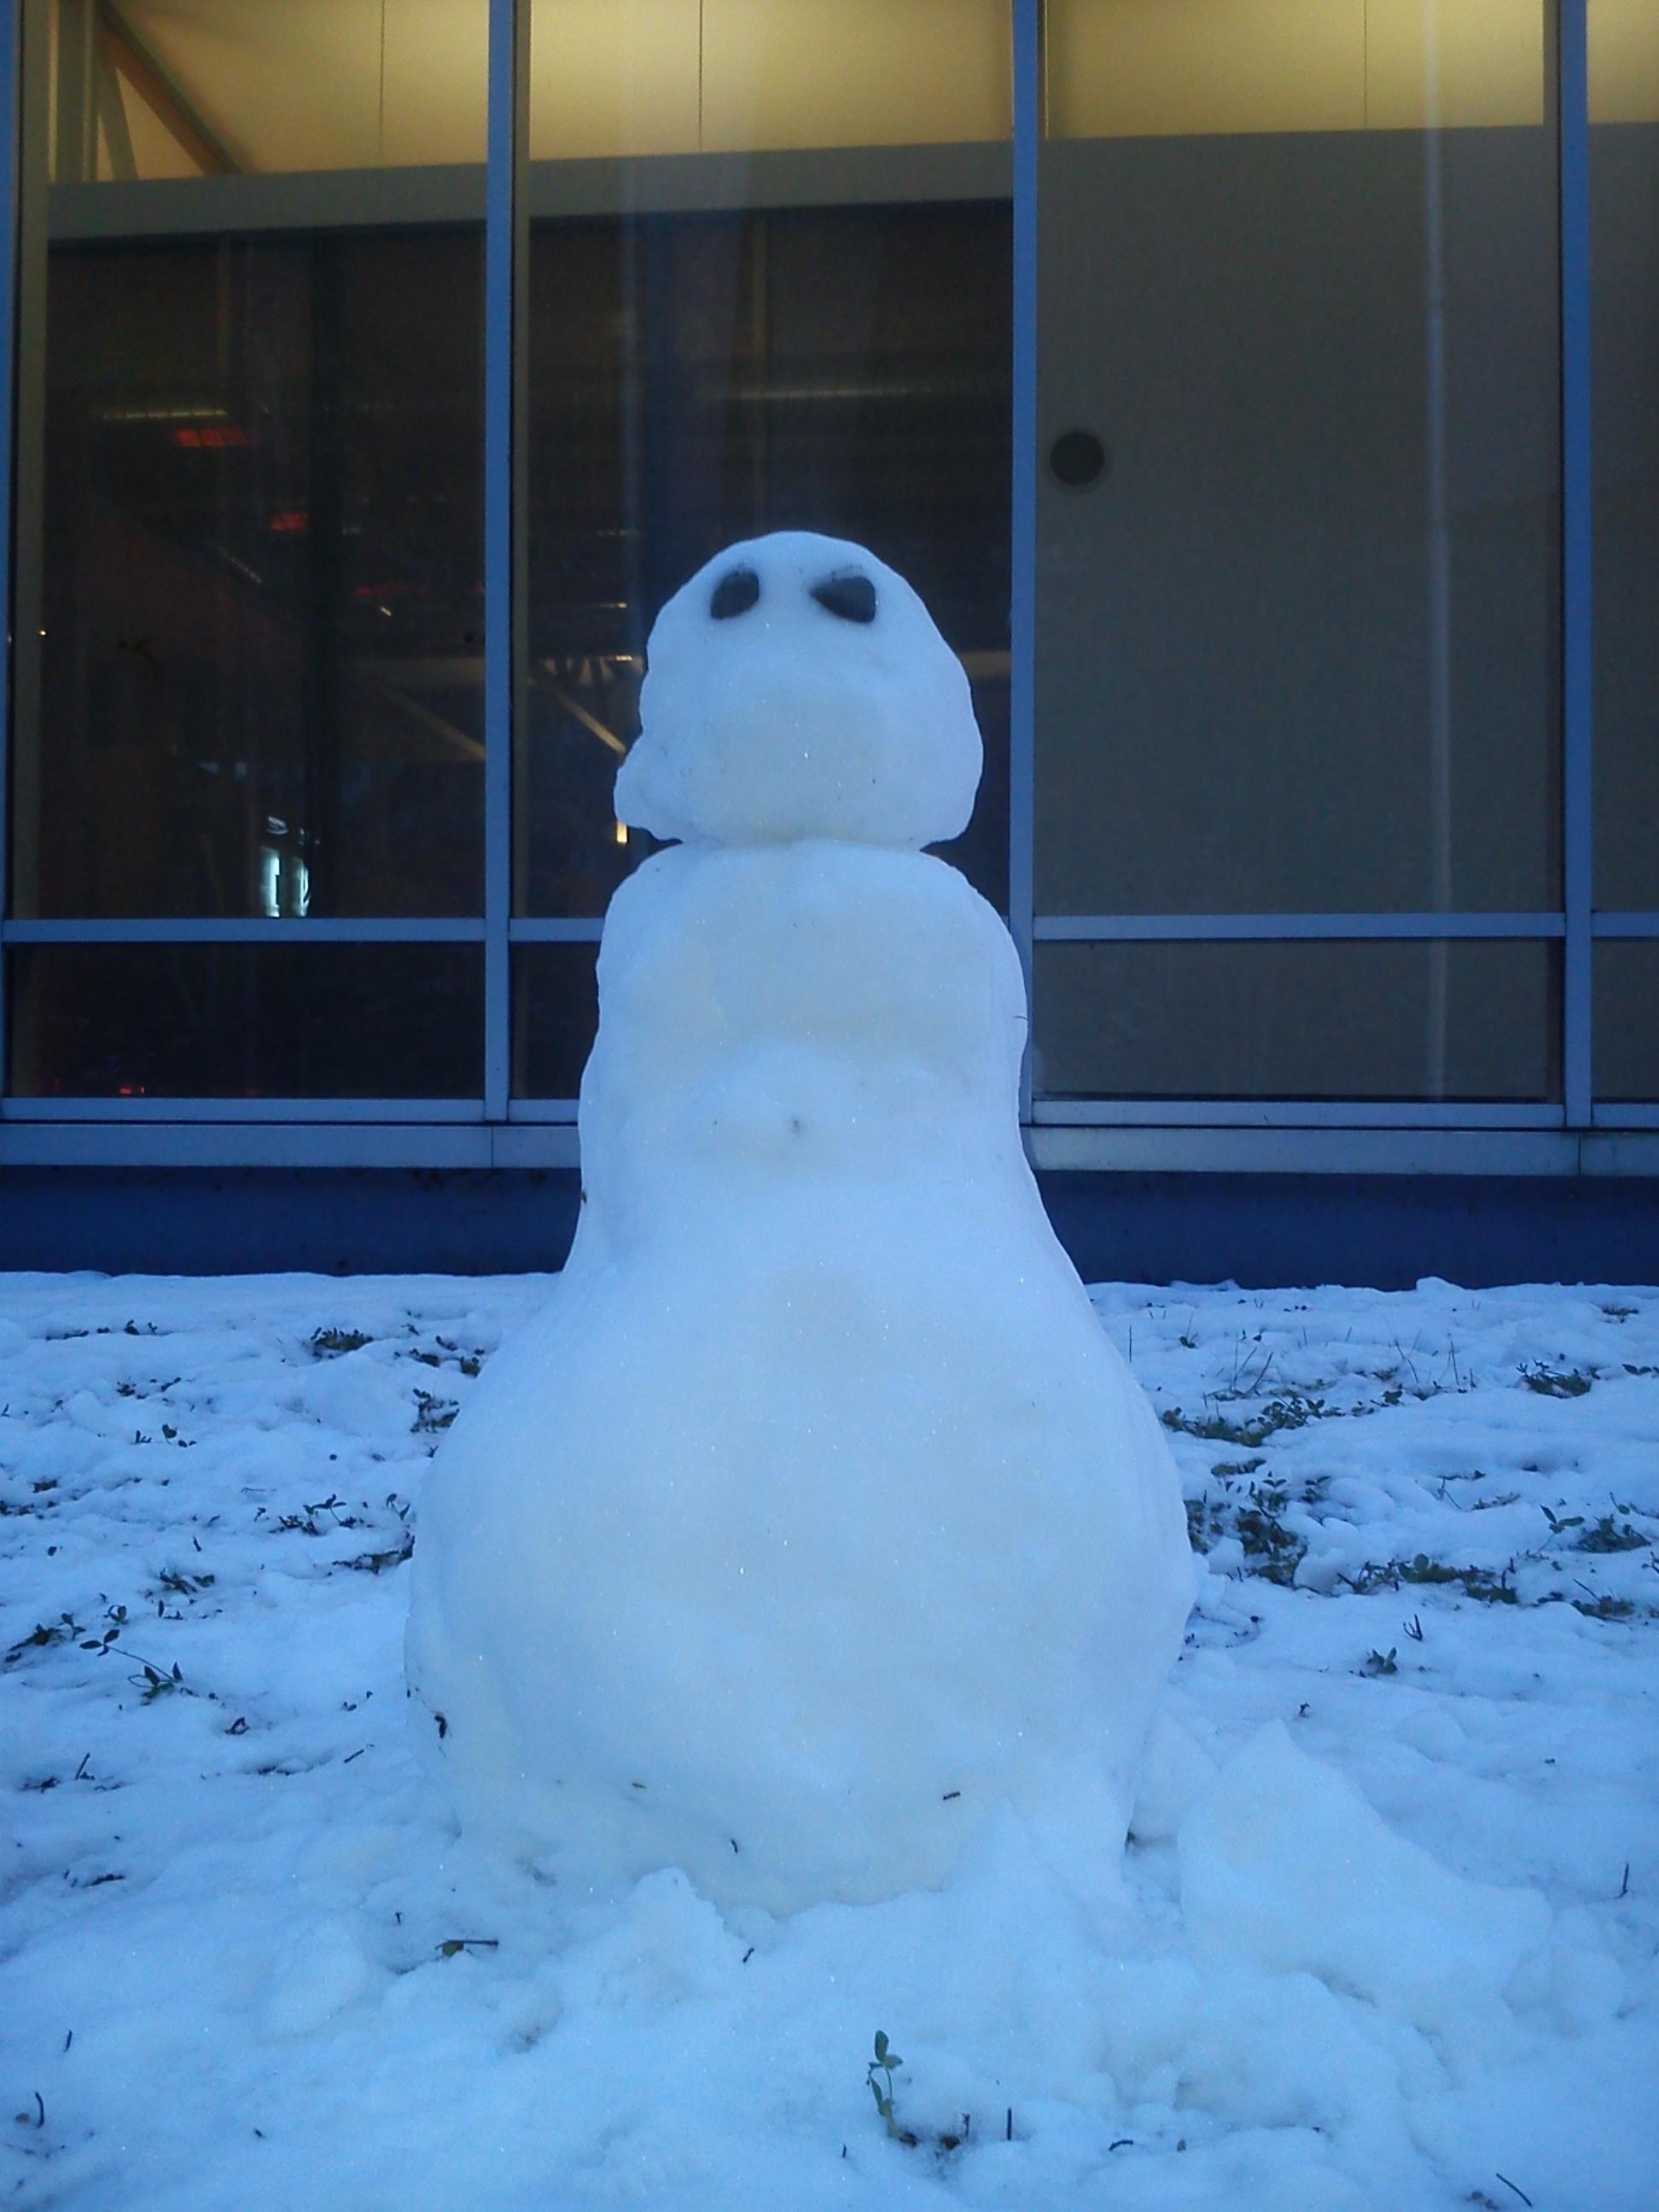 Alternativprogramm bei Schneefall